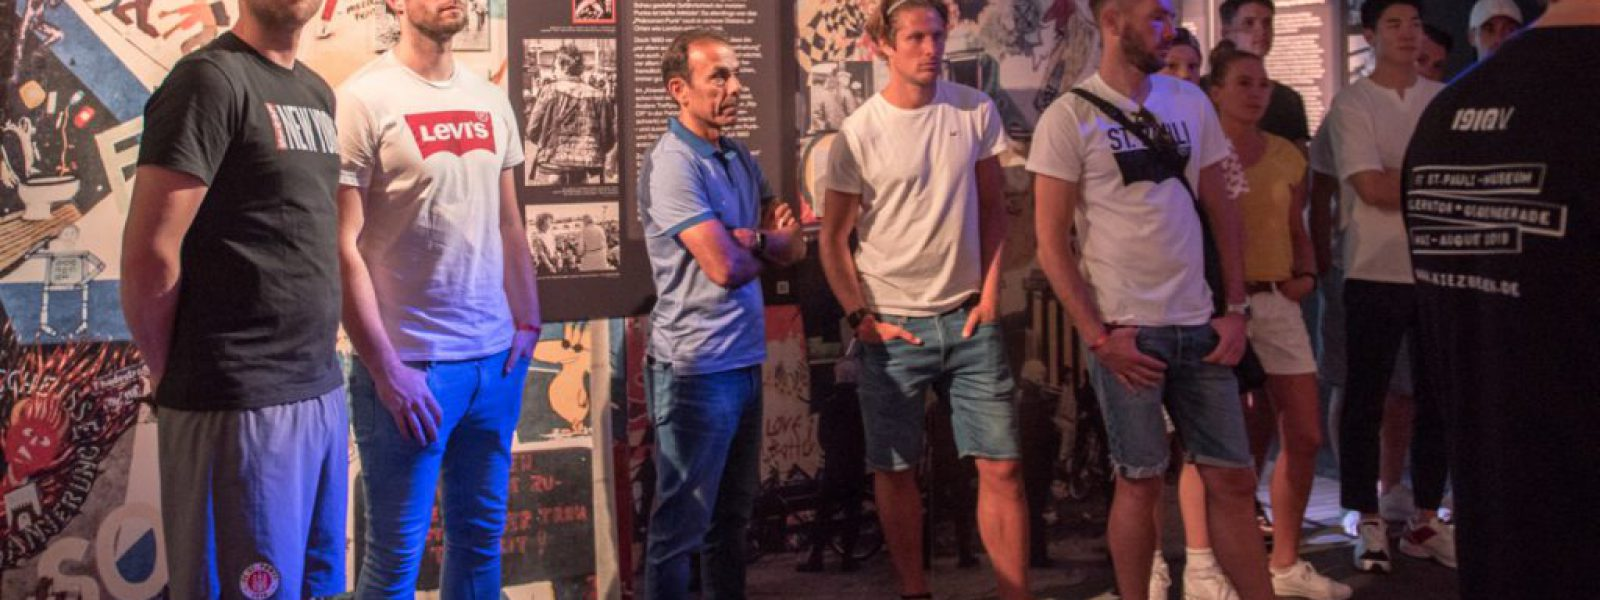 2019_0623 FC St Pauli erste Mannschaft im KIEZBEBEN (Foto Sabrina Adeline Nagel) - 10